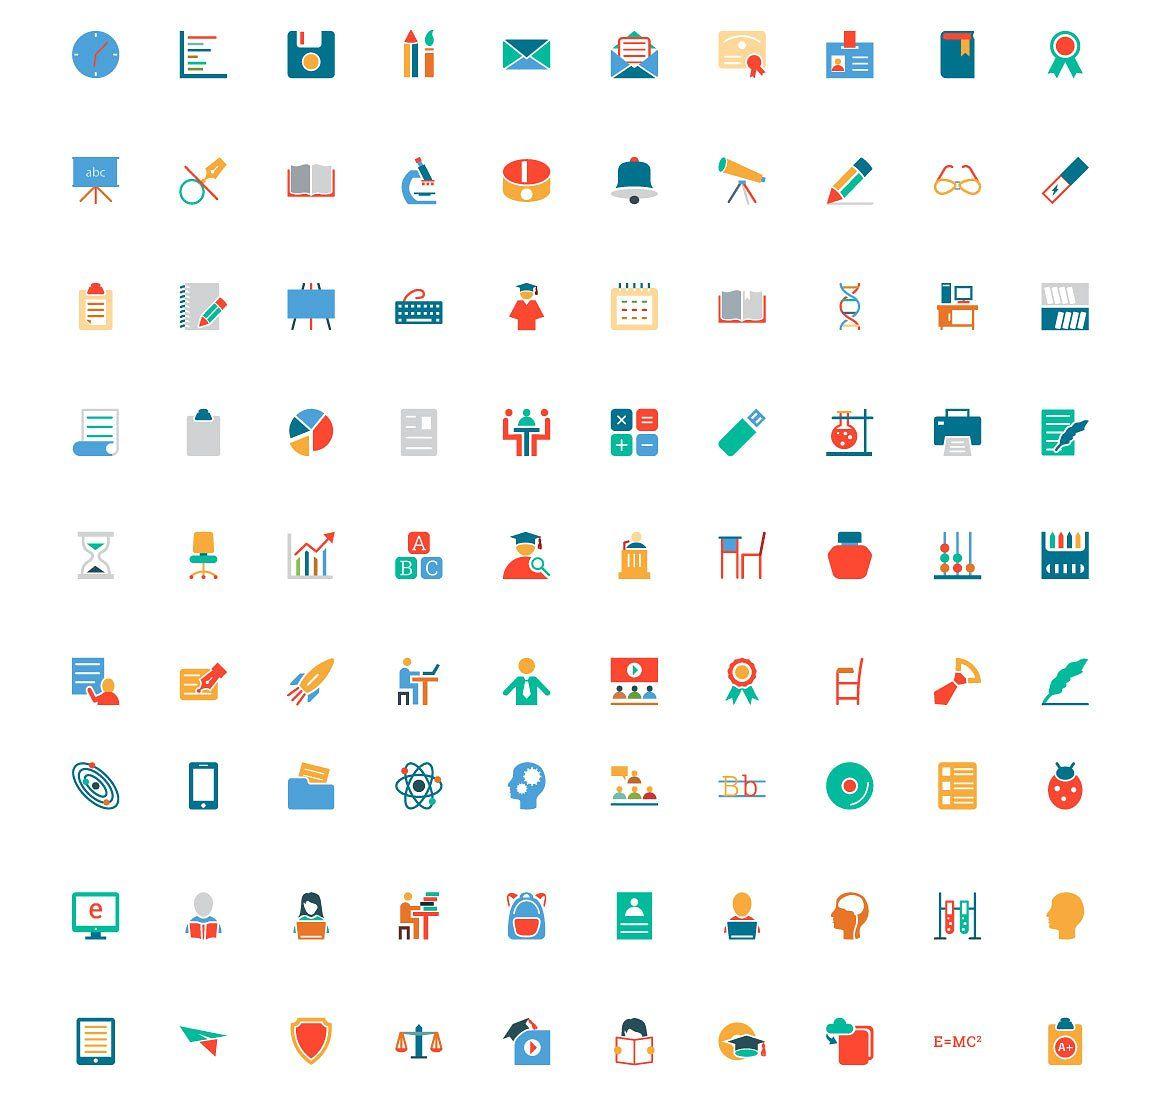 300+ Education Colored Icons icon, flaticon, icons, icon